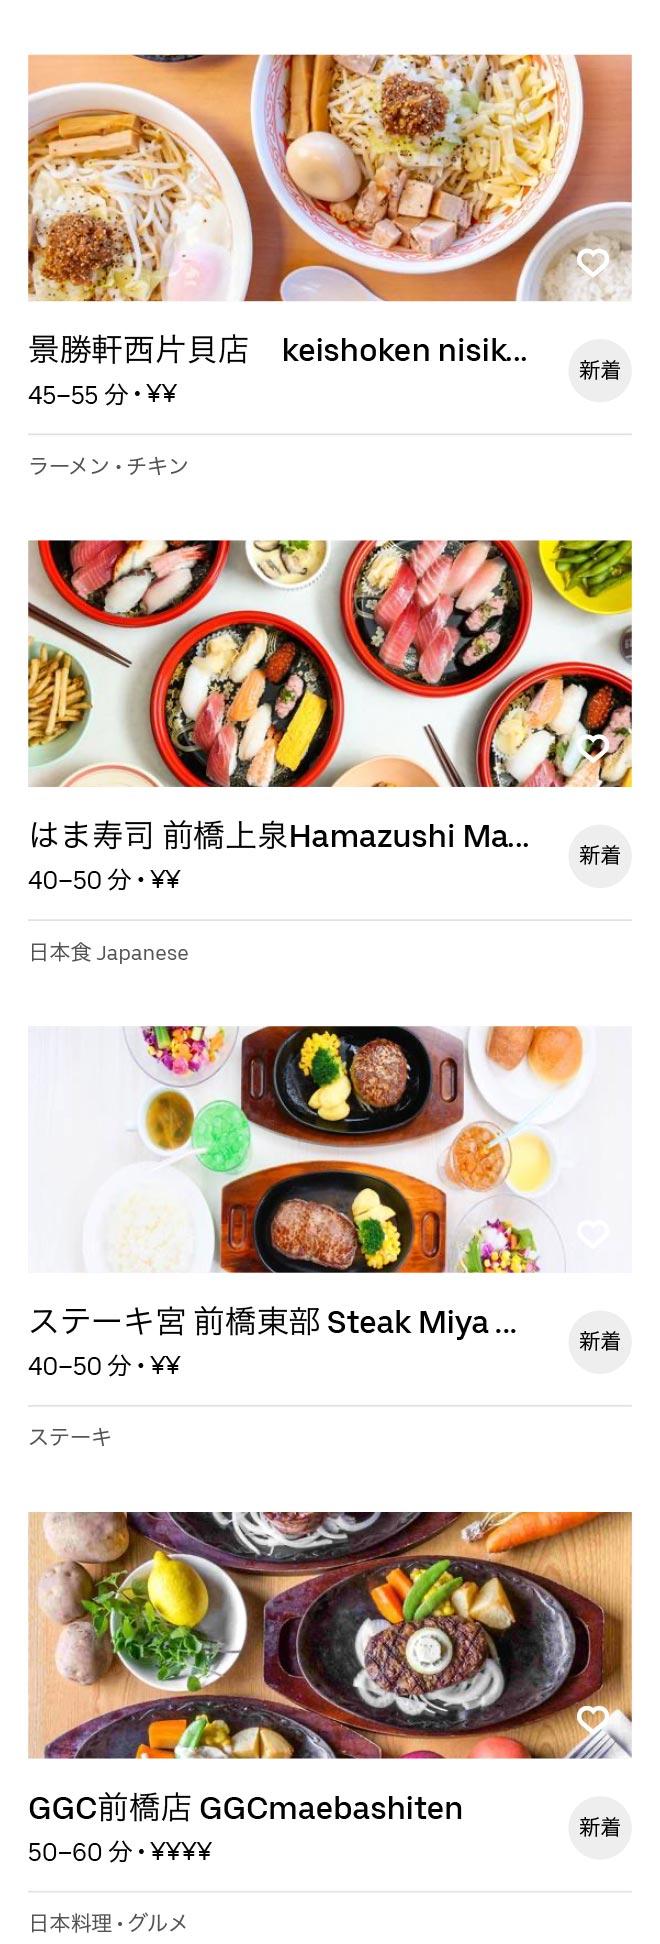 Chuou maebashi menu 2009 3